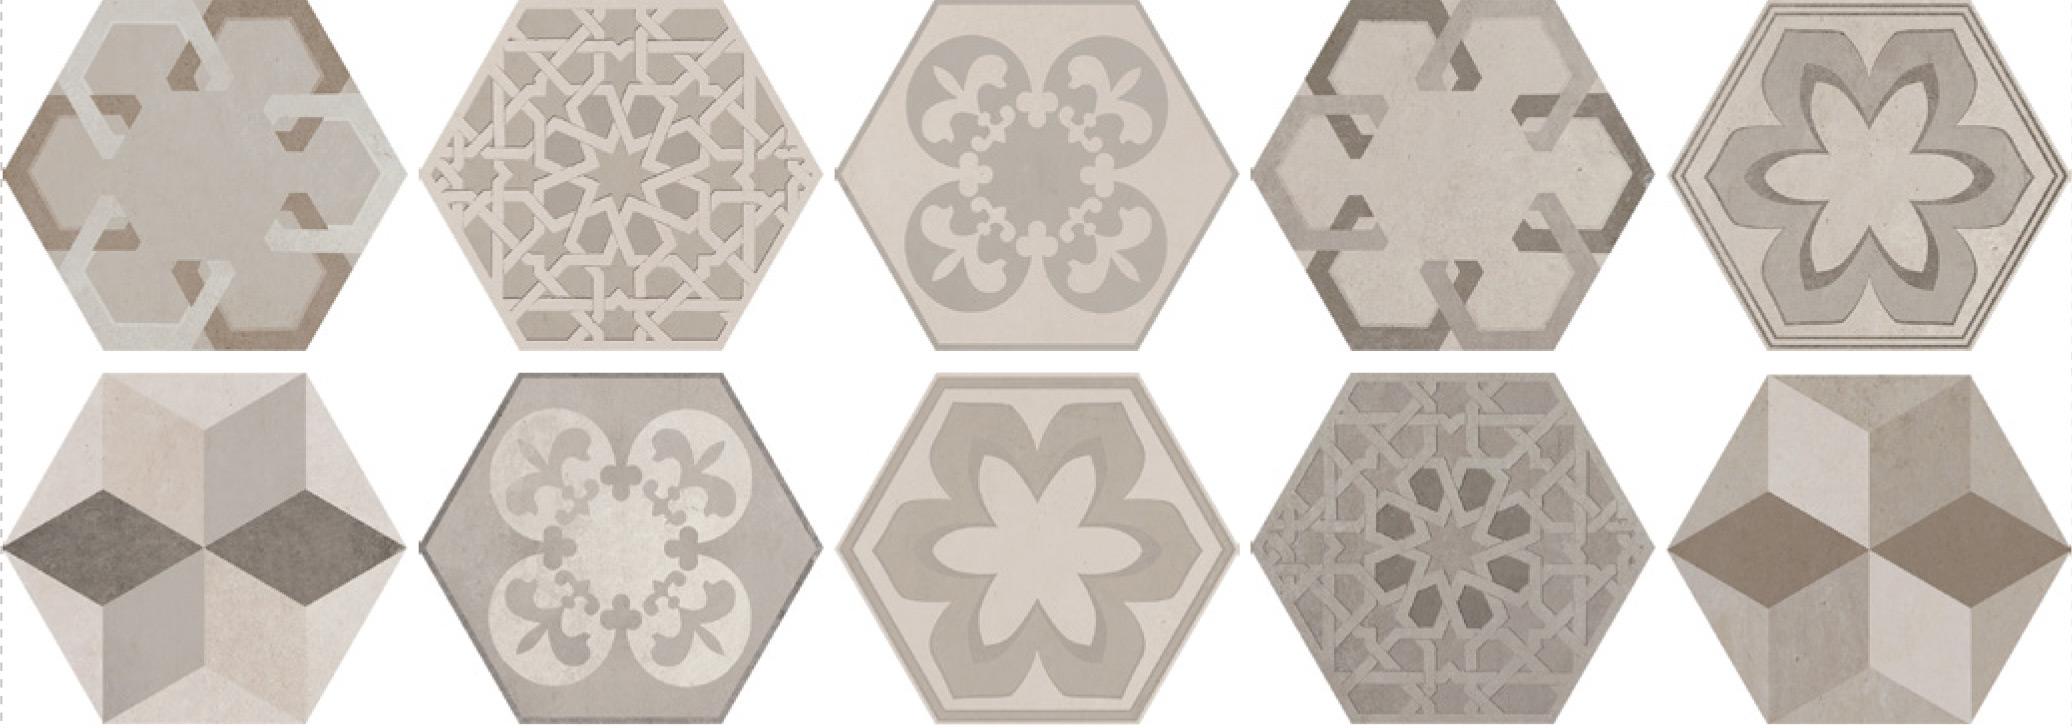 Savoia Domus  Decori Mix SA-S4013DEC Bodenfliese 40x40 matt  Hexagon